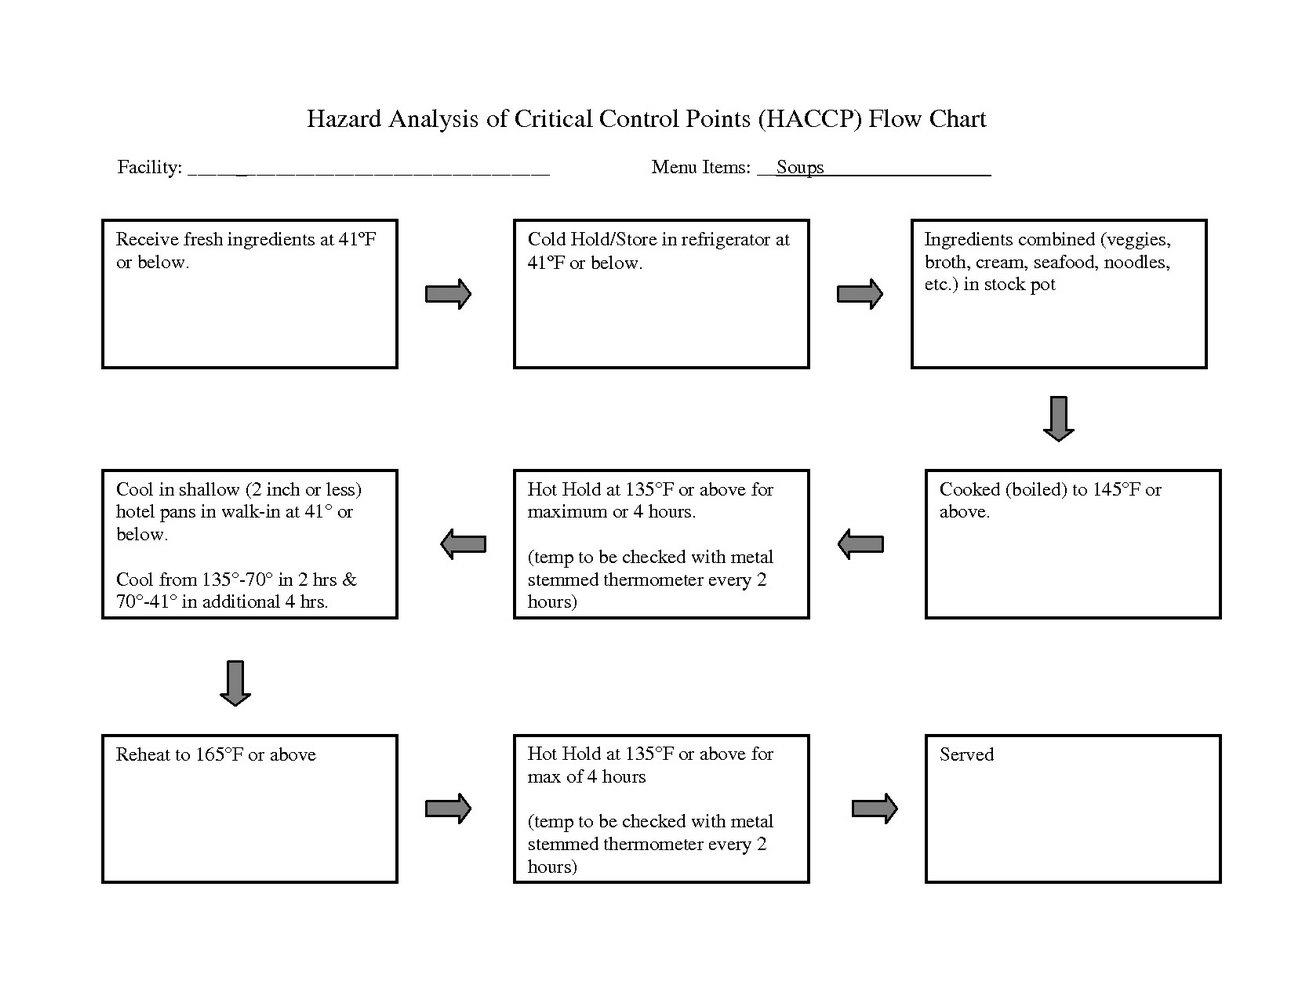 Haccp Plan Flow Chart Template